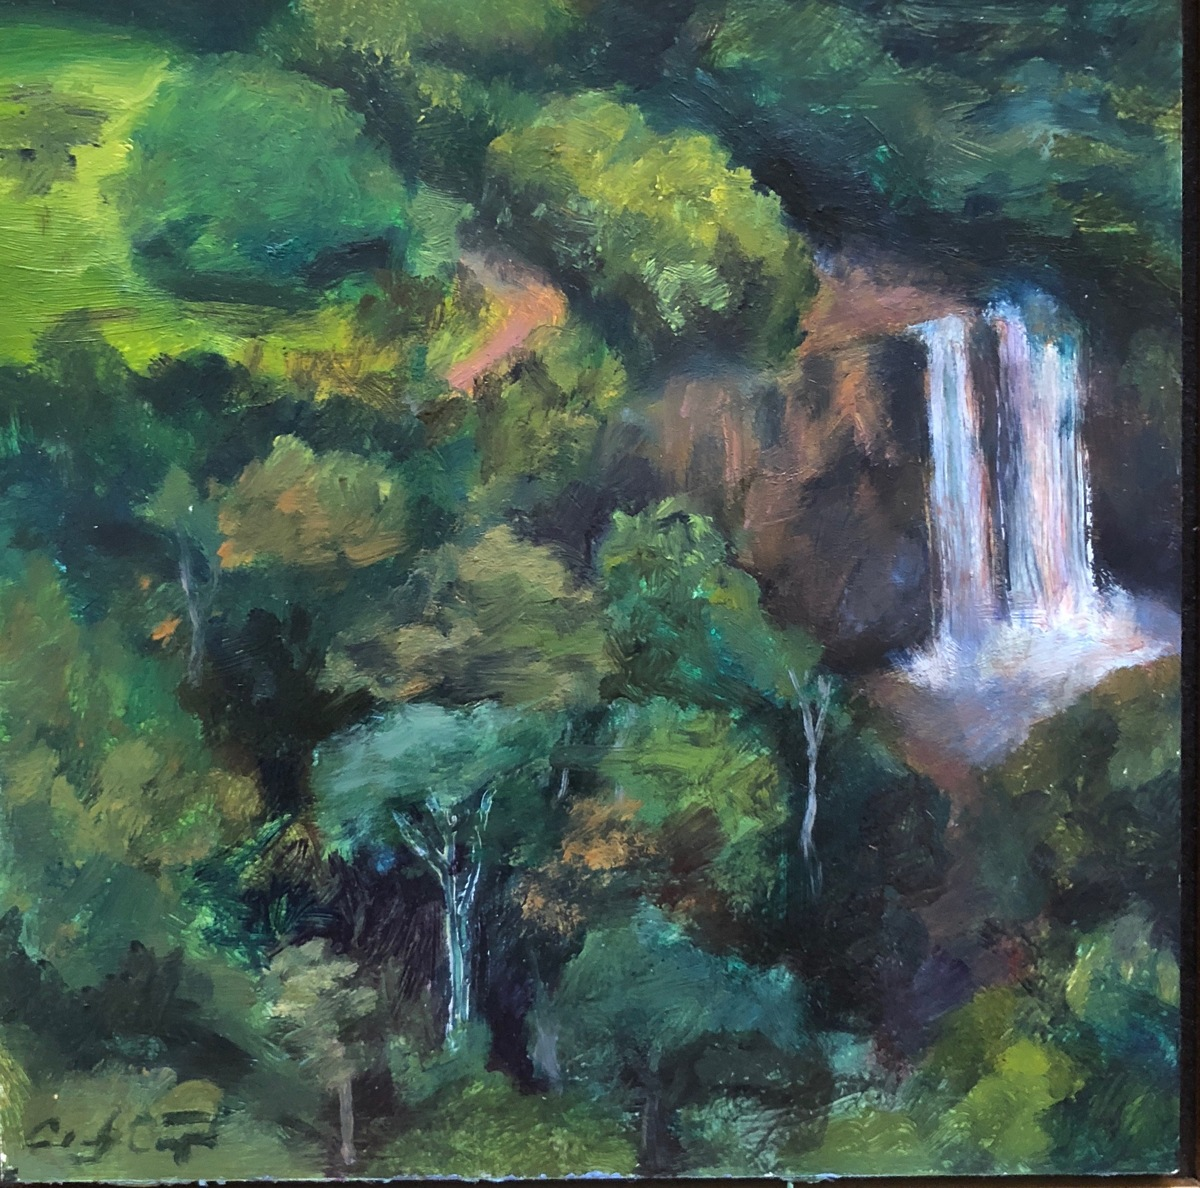 Fantasy Island Waterfall, Kauai (large view)